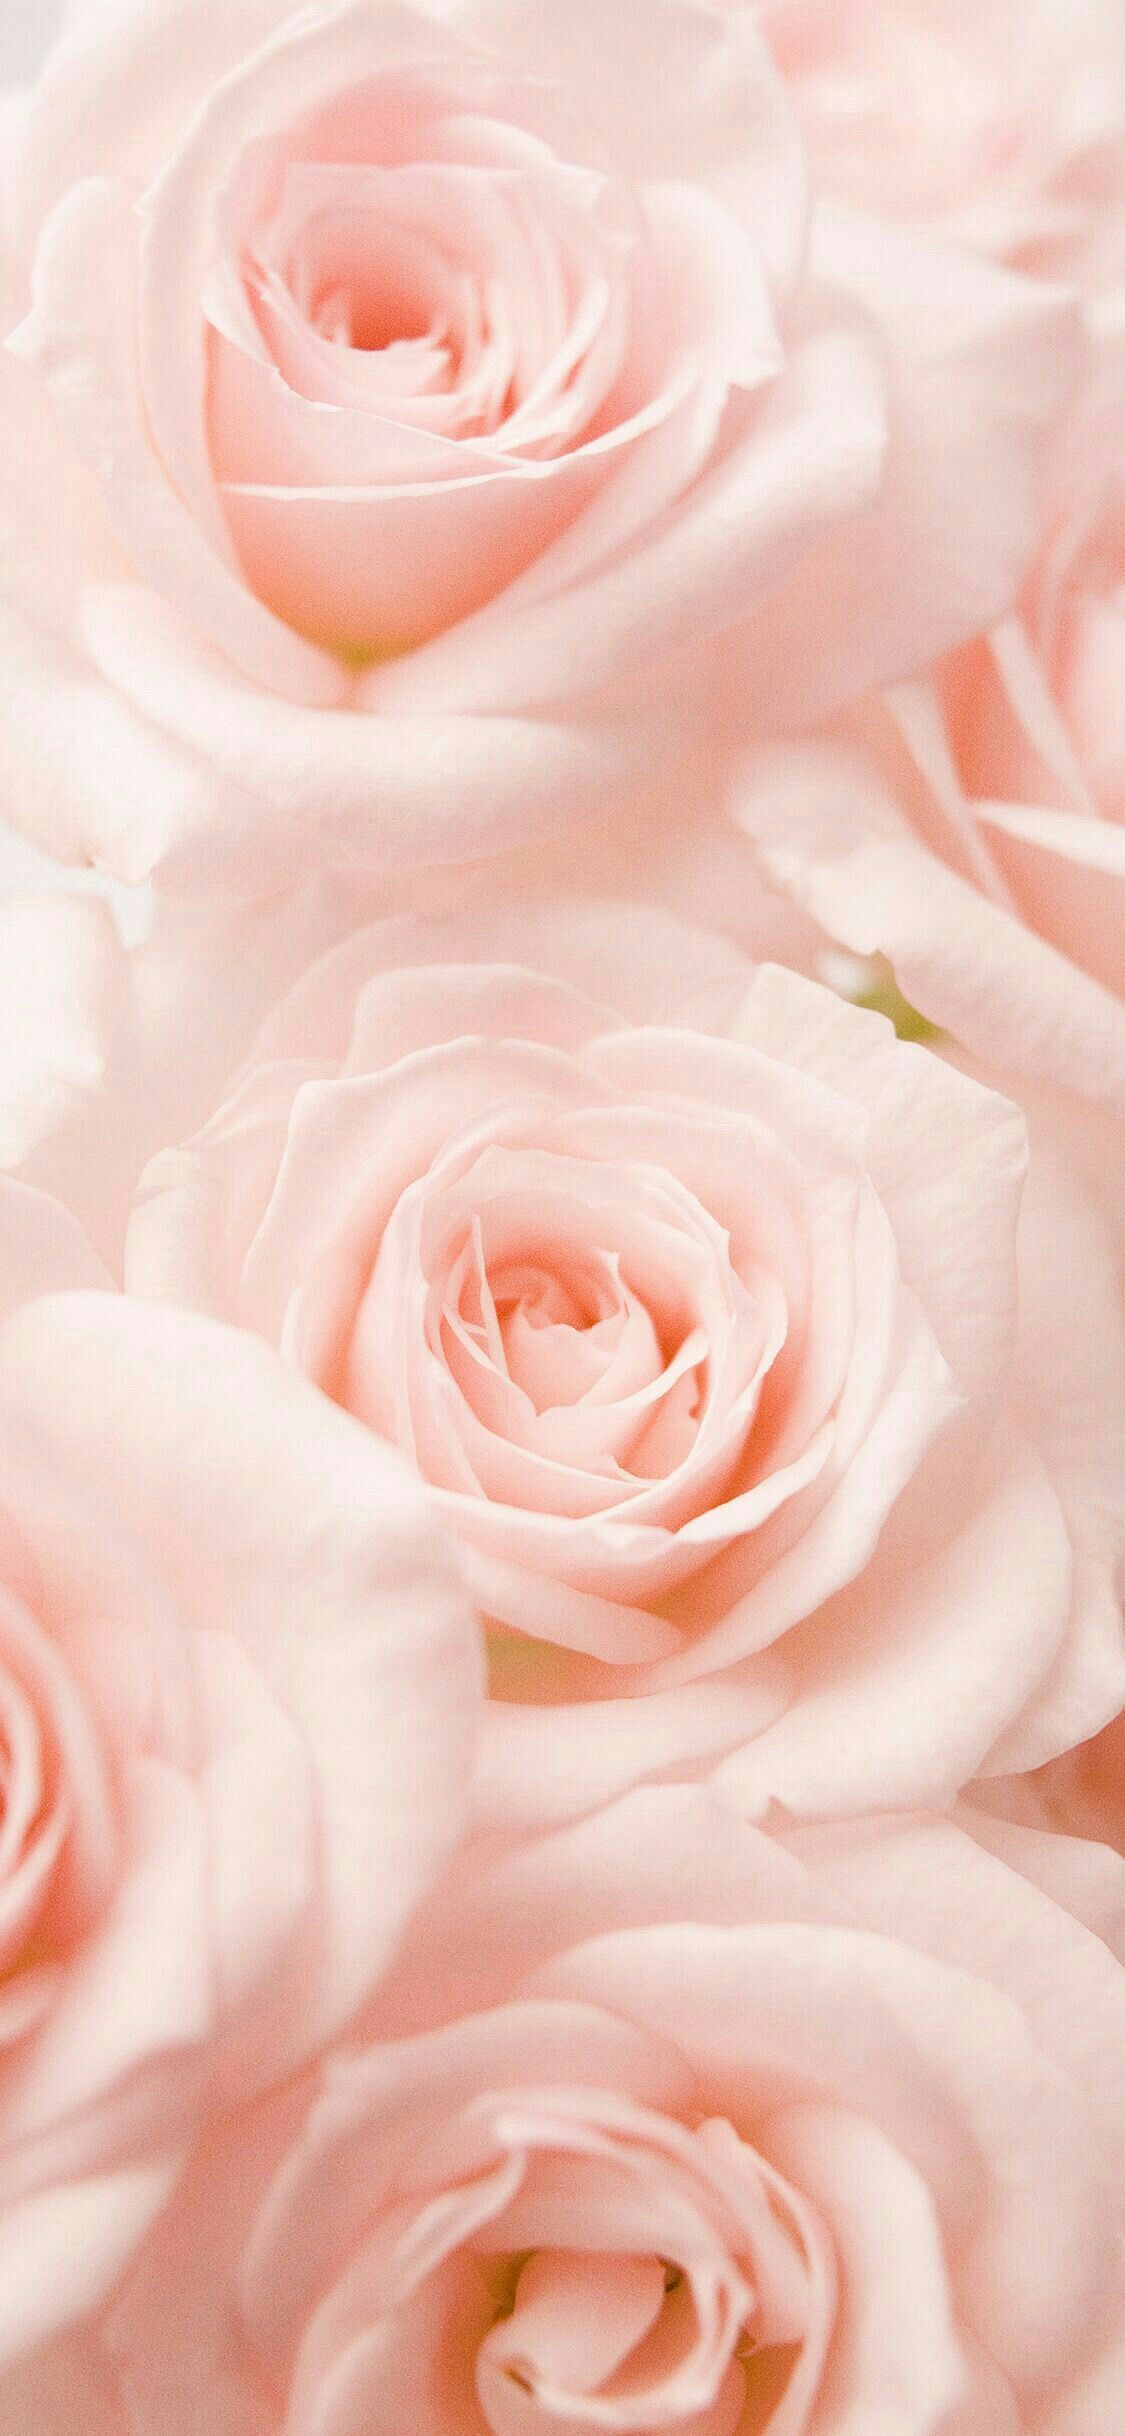 Pin By Laura Gantt On Wallpaper Wallpaper Iphone Roses Rose Flower Wallpaper Flower Iphone Wallpaper